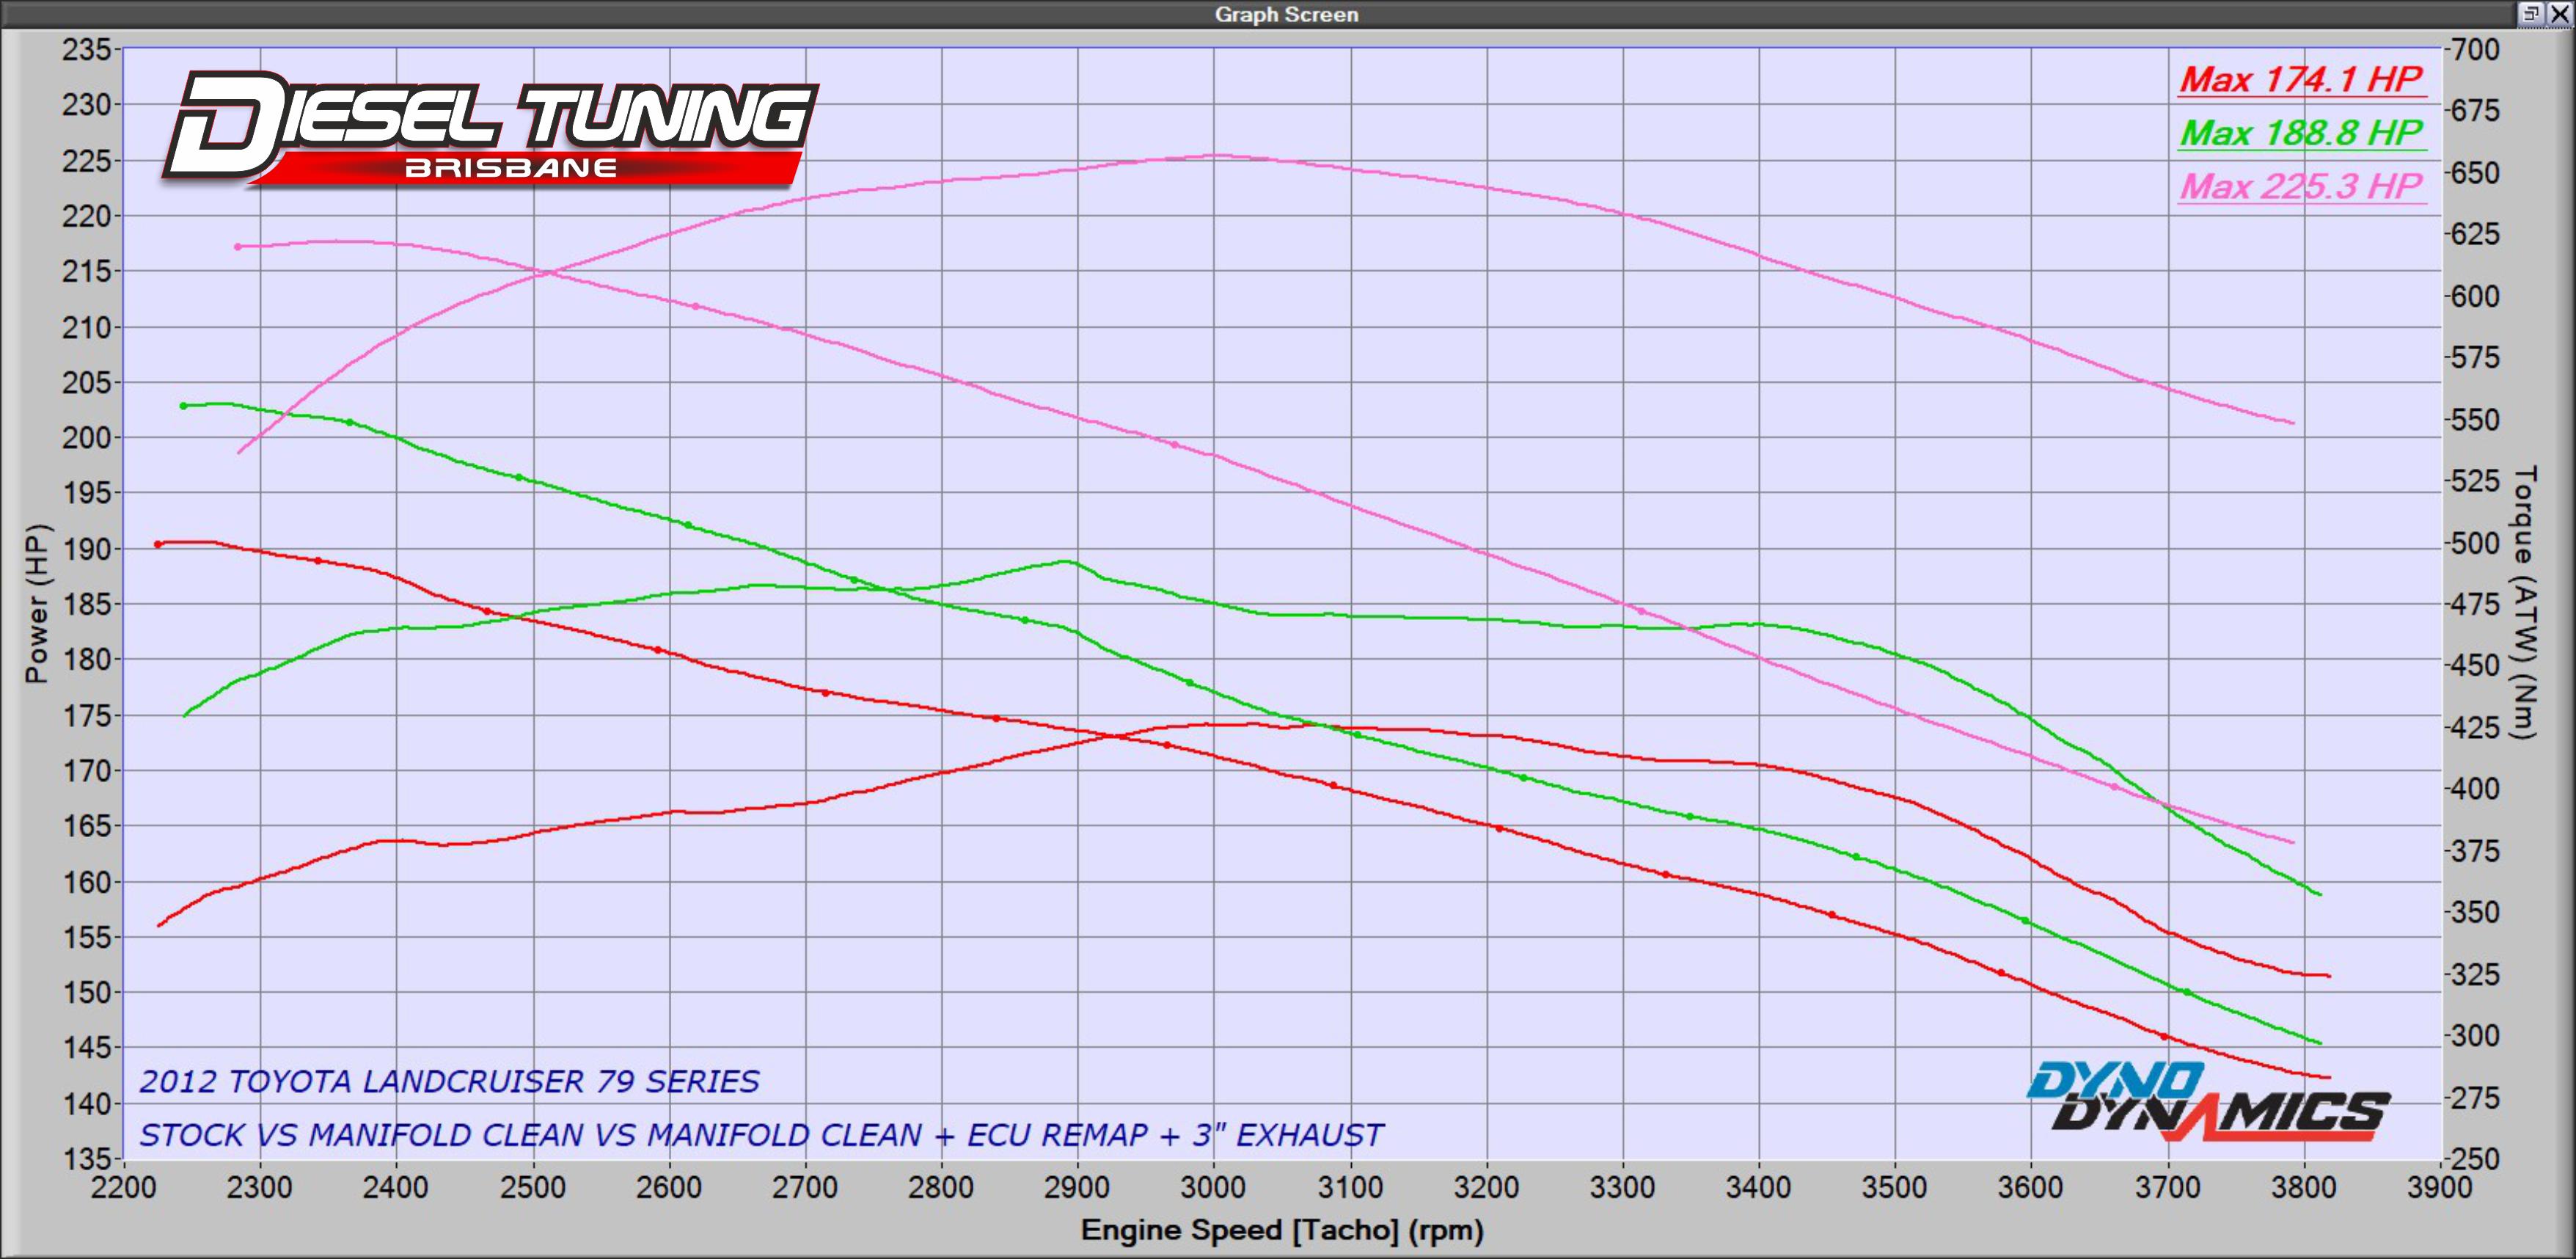 Pre-DPF 200 Series ECU Remap + 3.0 Exhaust + Manifold Clean